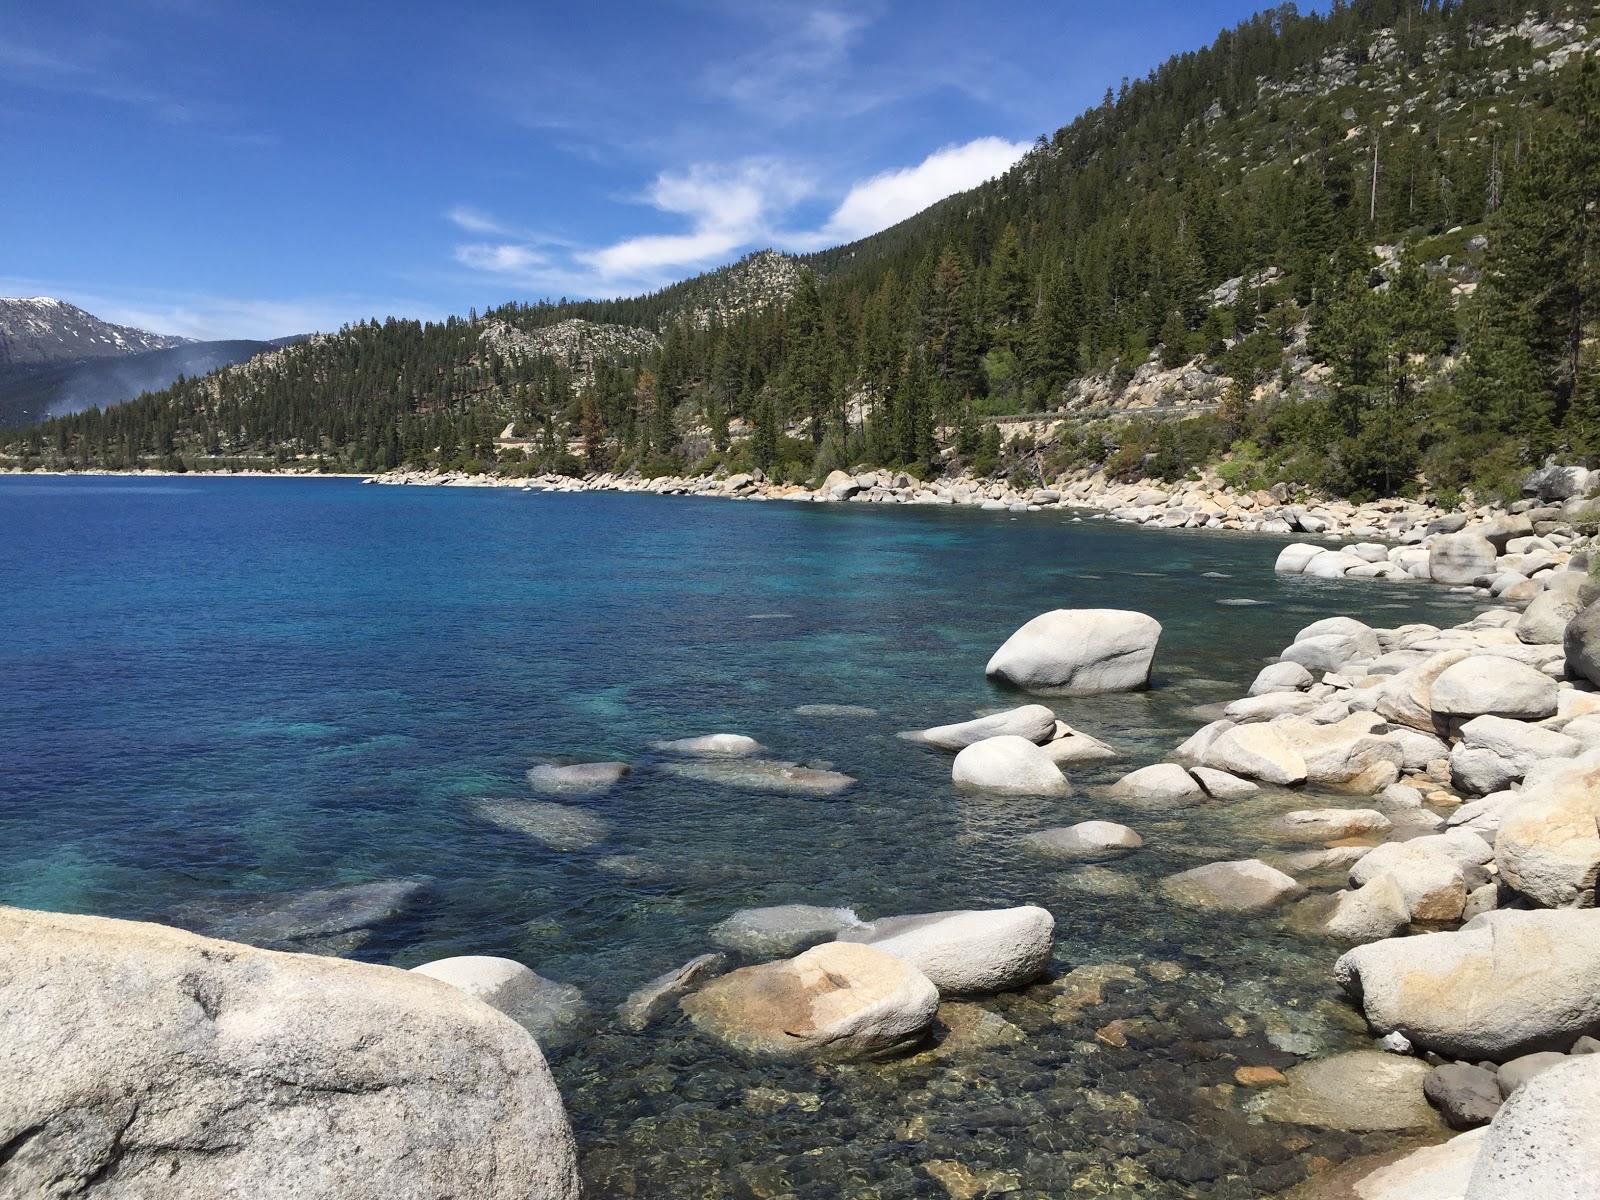 lake tahoe beach nature prservation